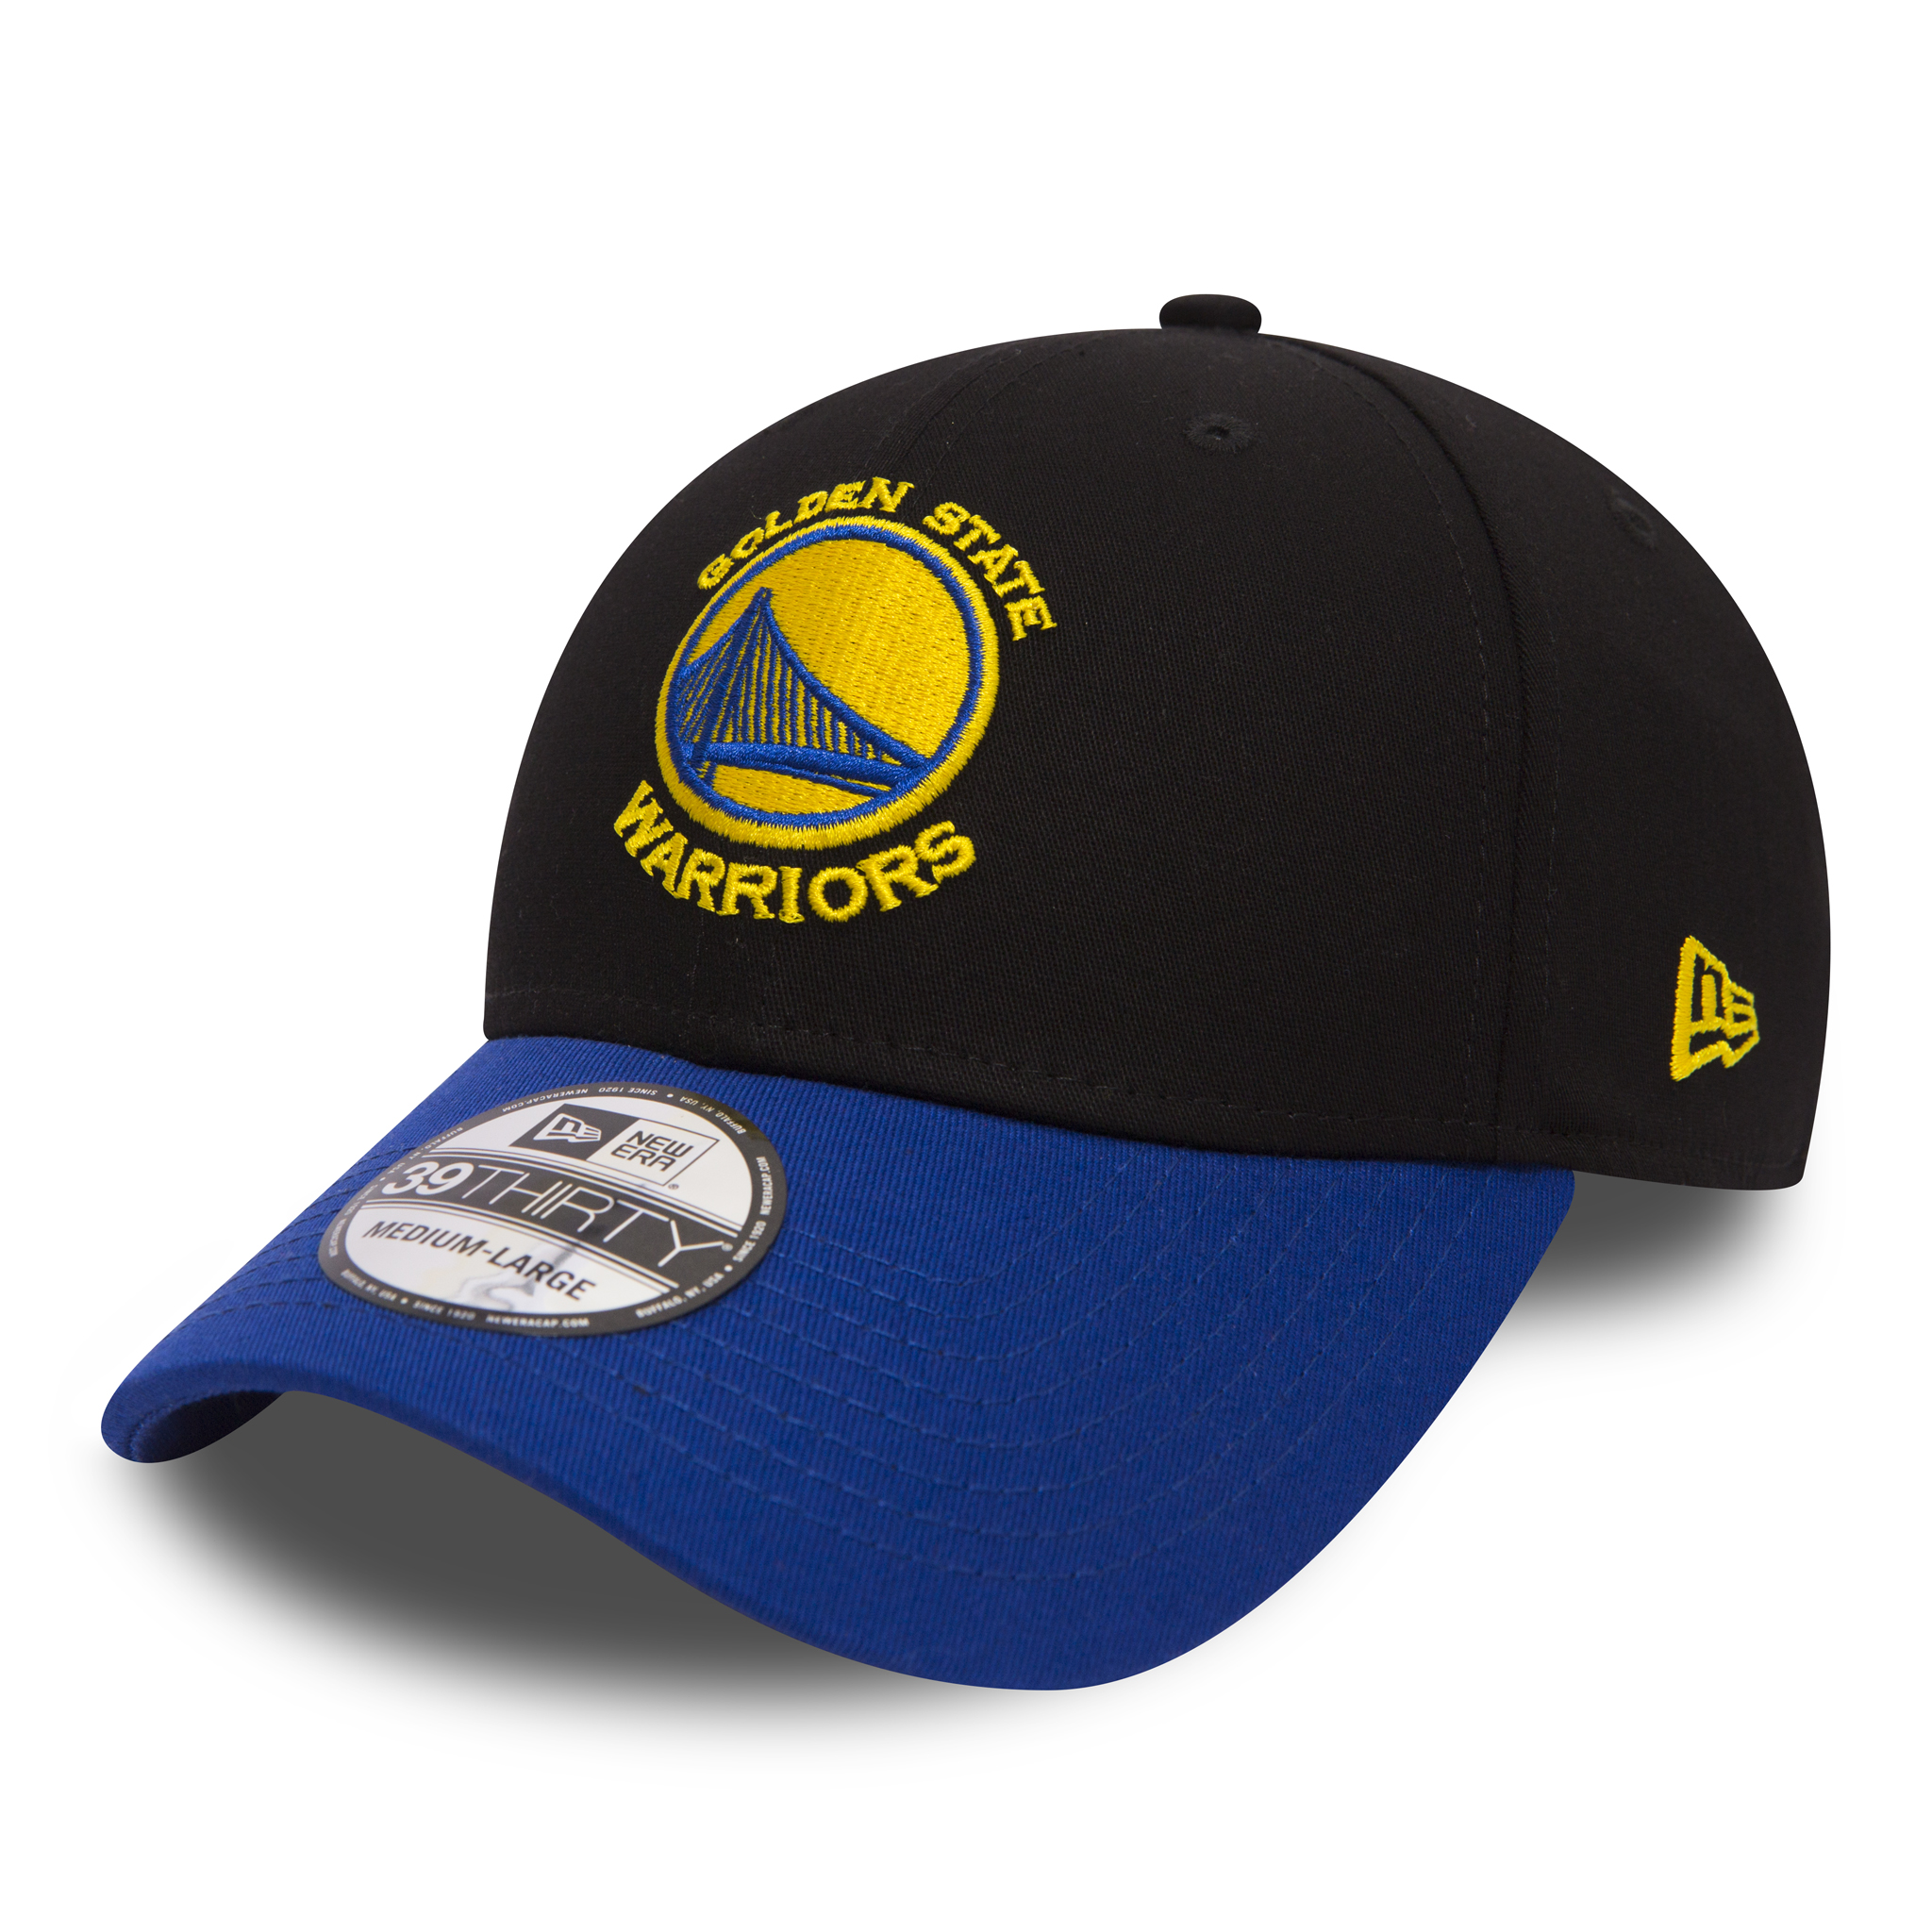 4298c0afadd8a New Era NBA Blackbase 39Thirty Golden State Warriors Snapback Cap Black OTC  SM. Our Price  £16.95